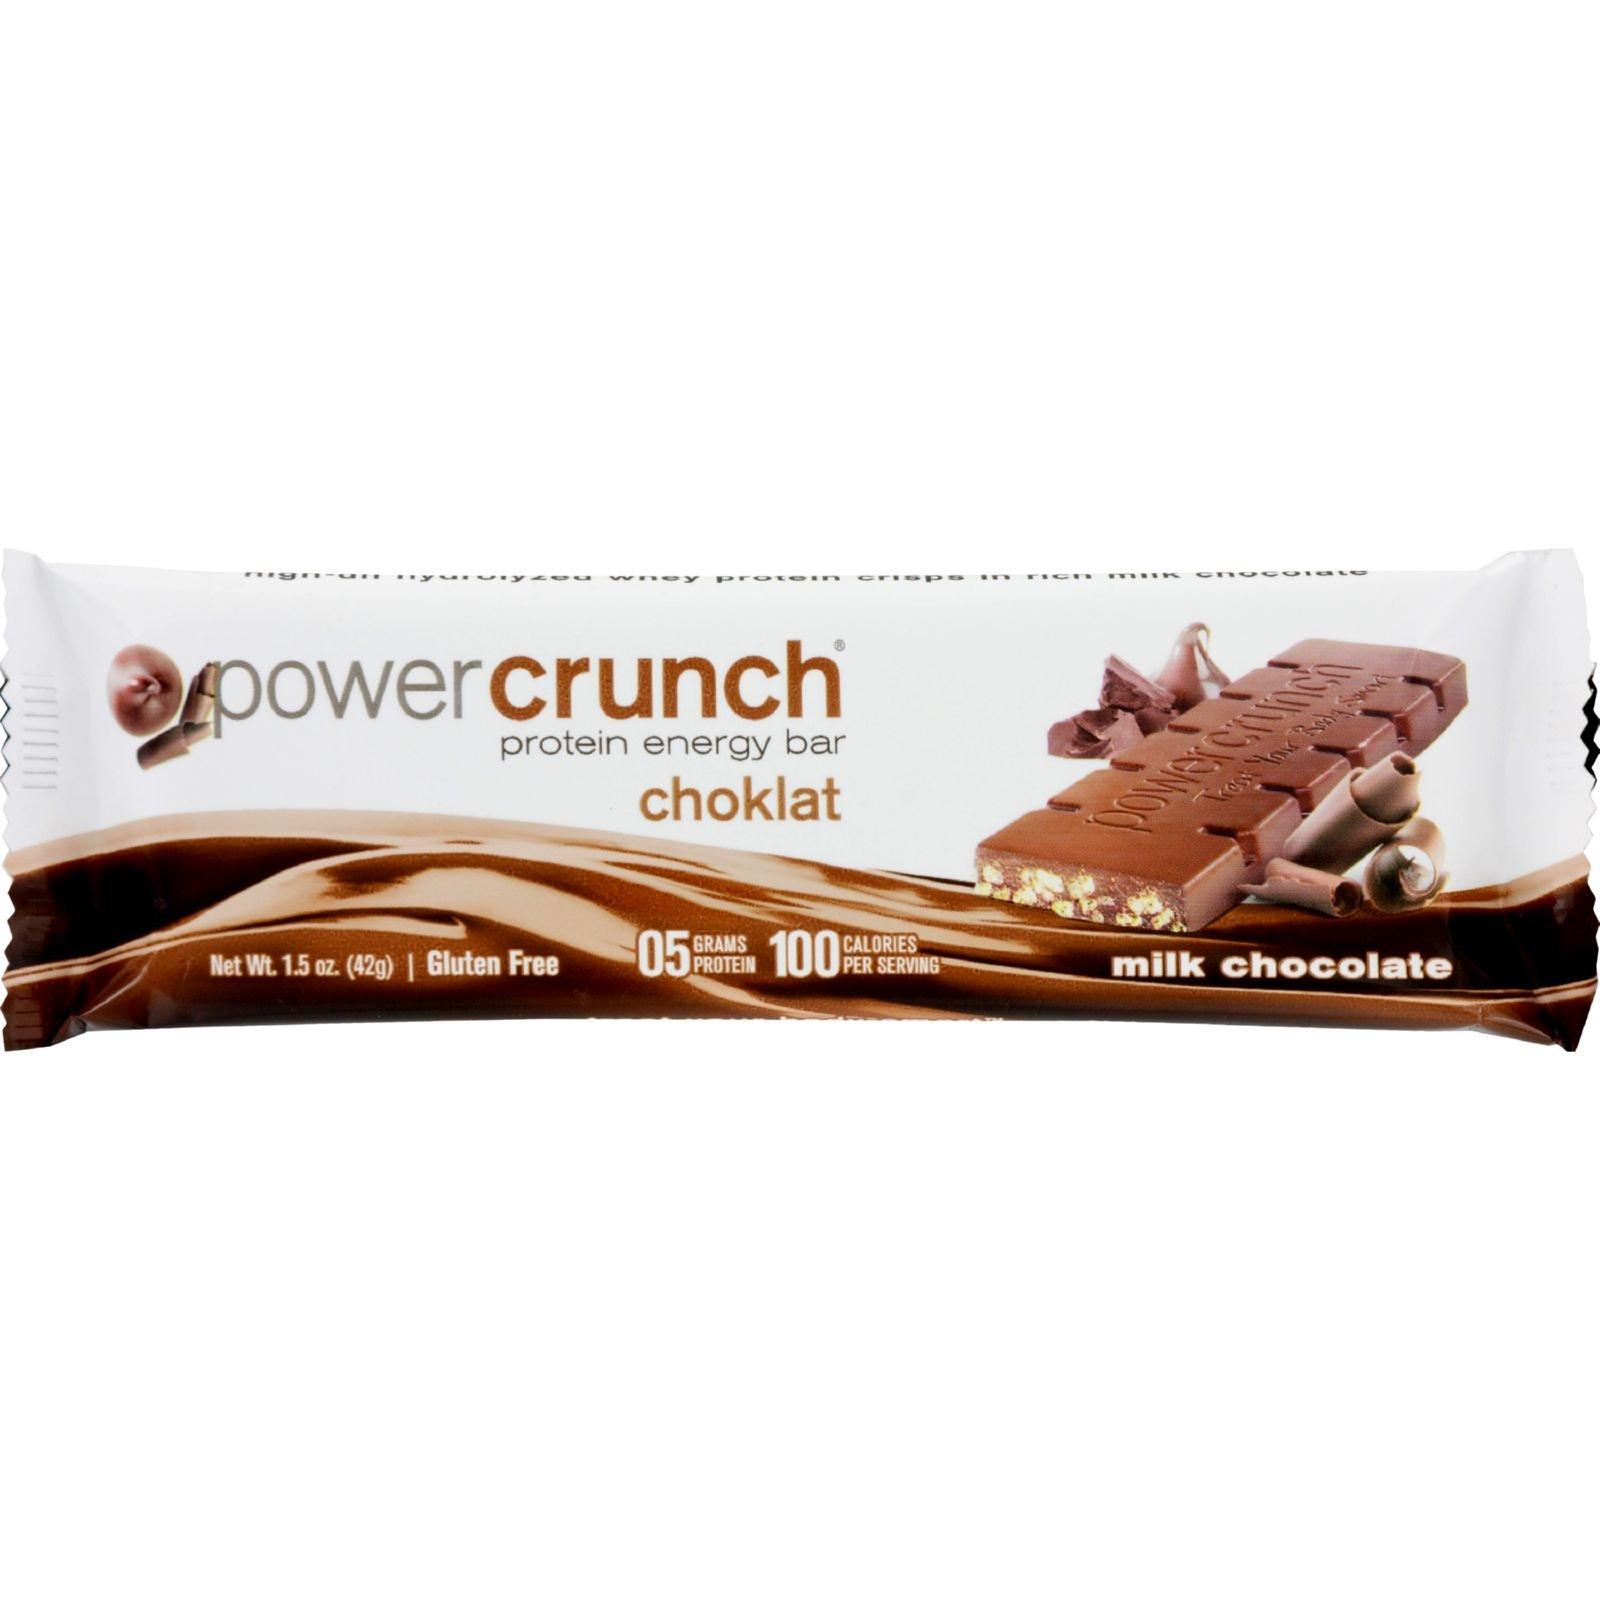 Power Crunch Bar - Chocolate Milk - Case of 12 - 1.4 oz by Power Crunch